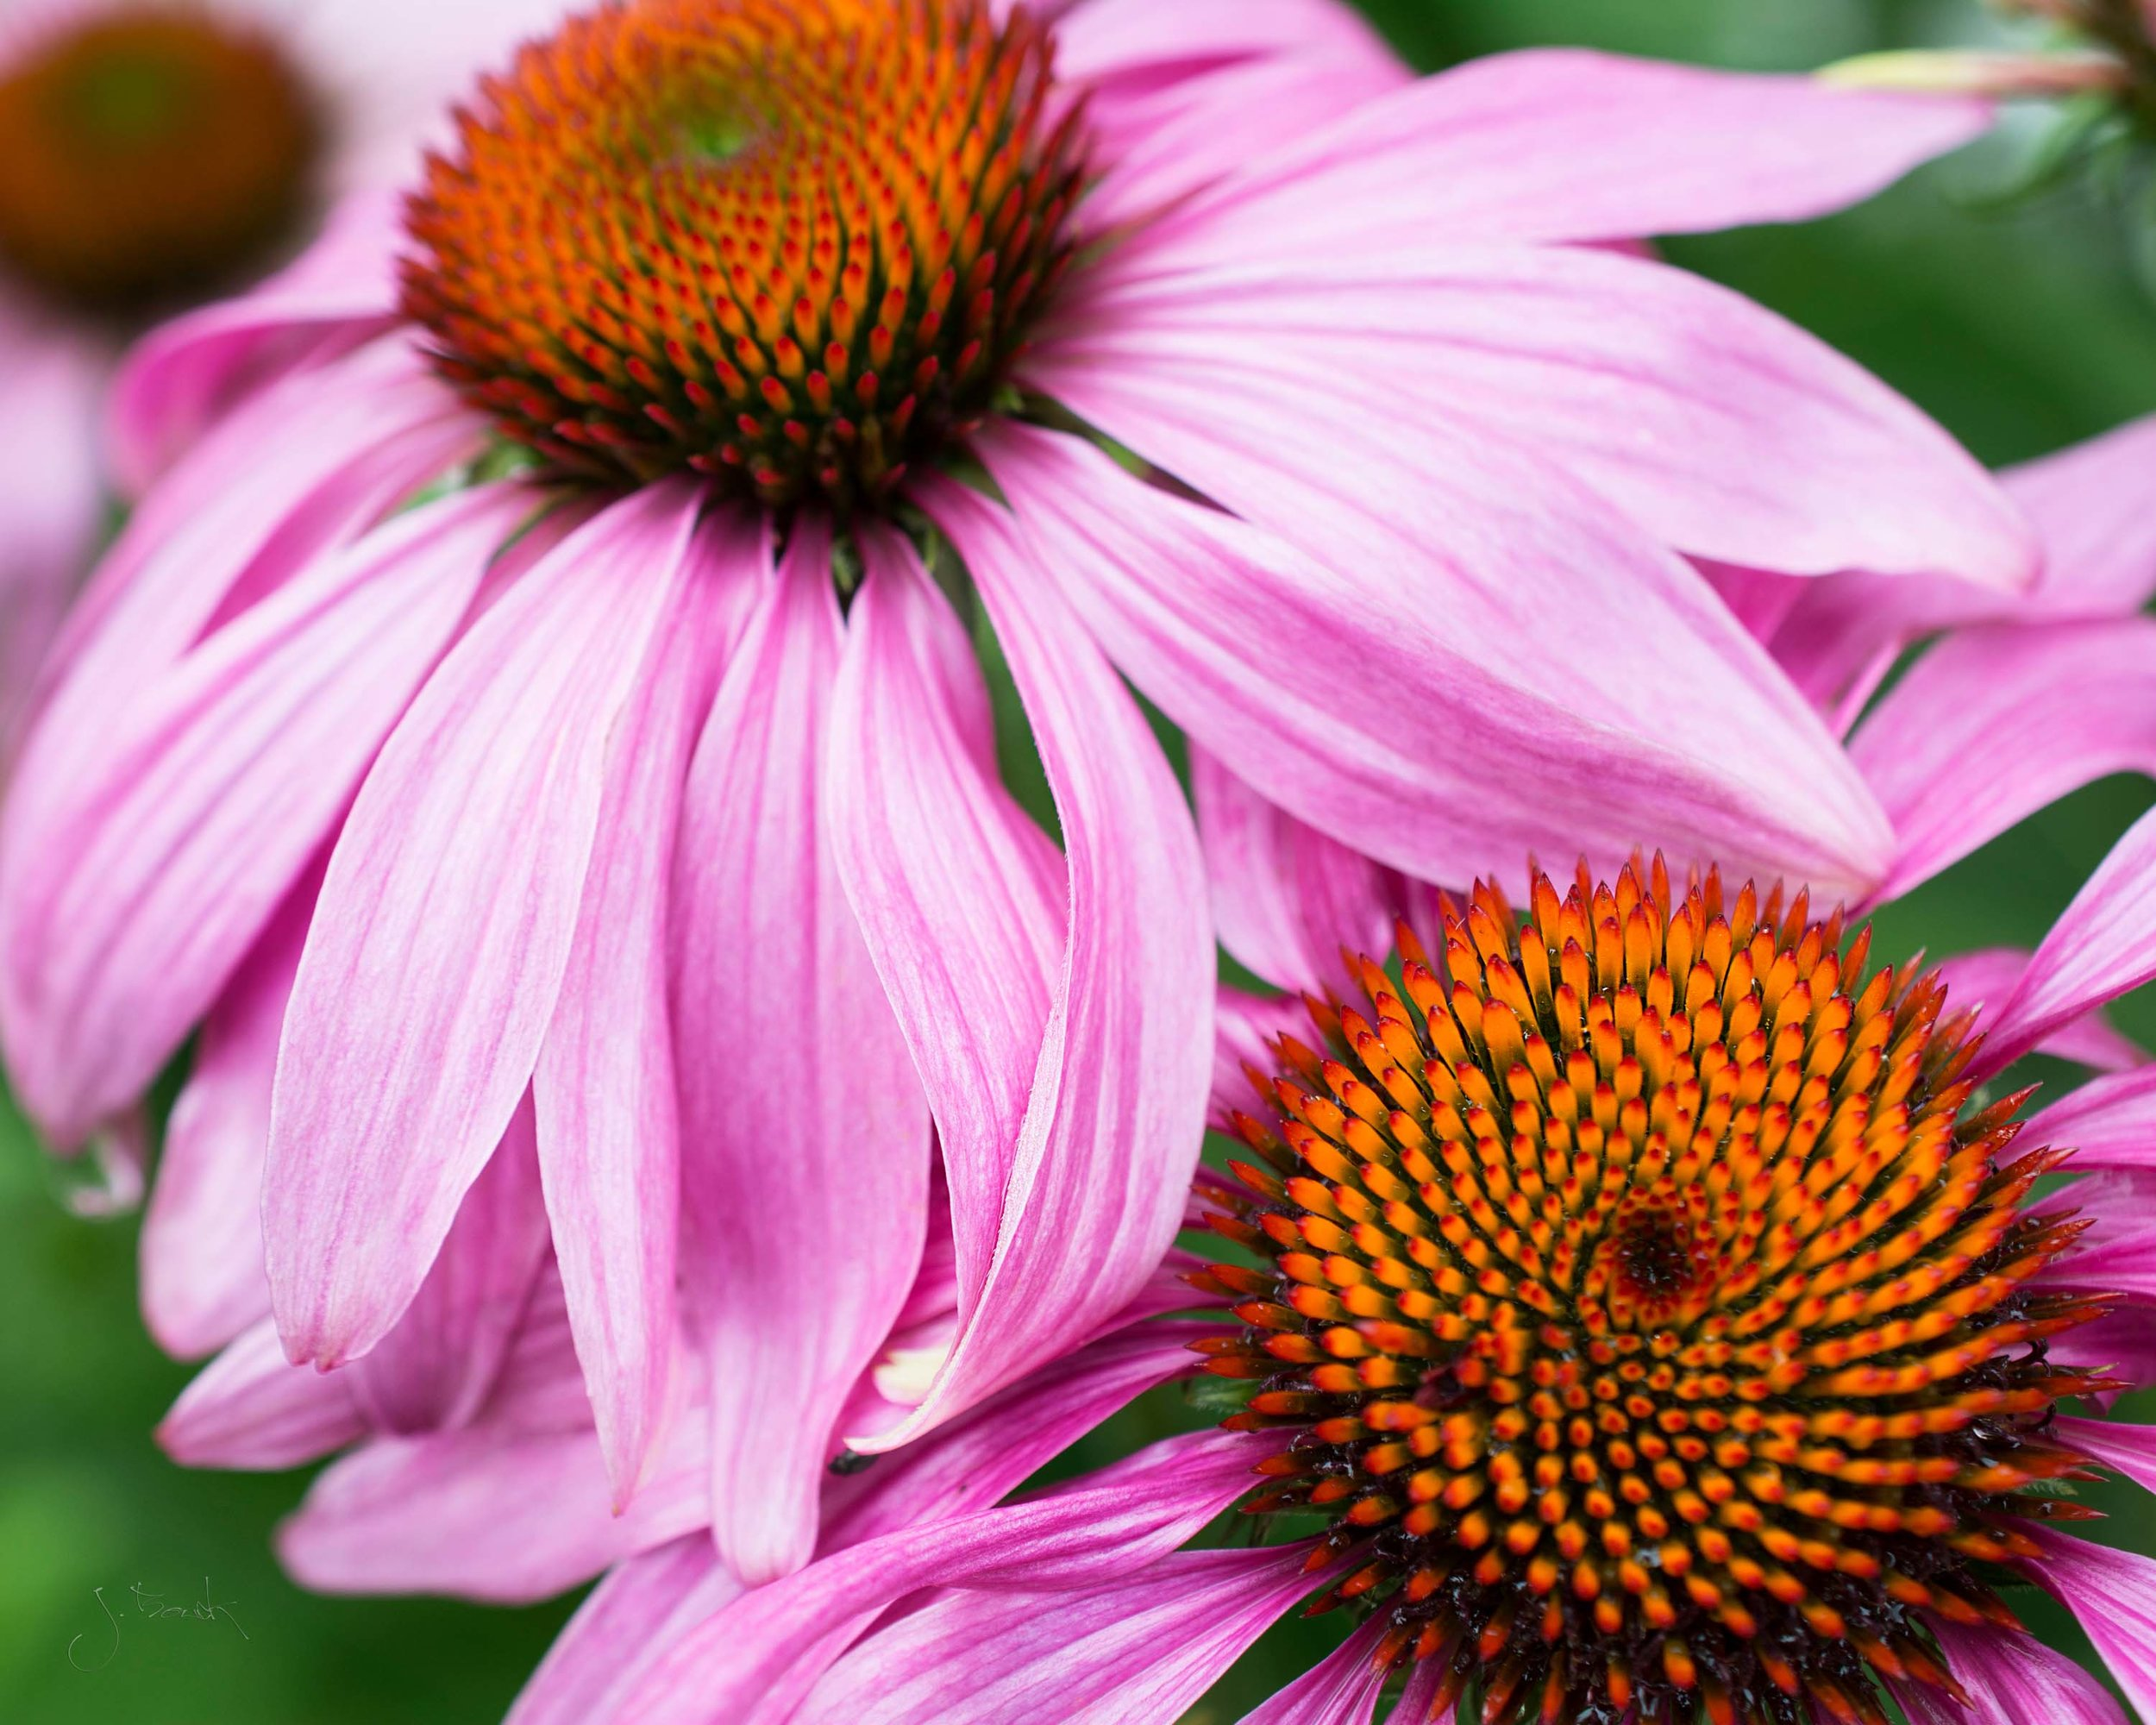 Cone Flower Study 8190 8x10 Floater Frame Gallery Wrap.jpg